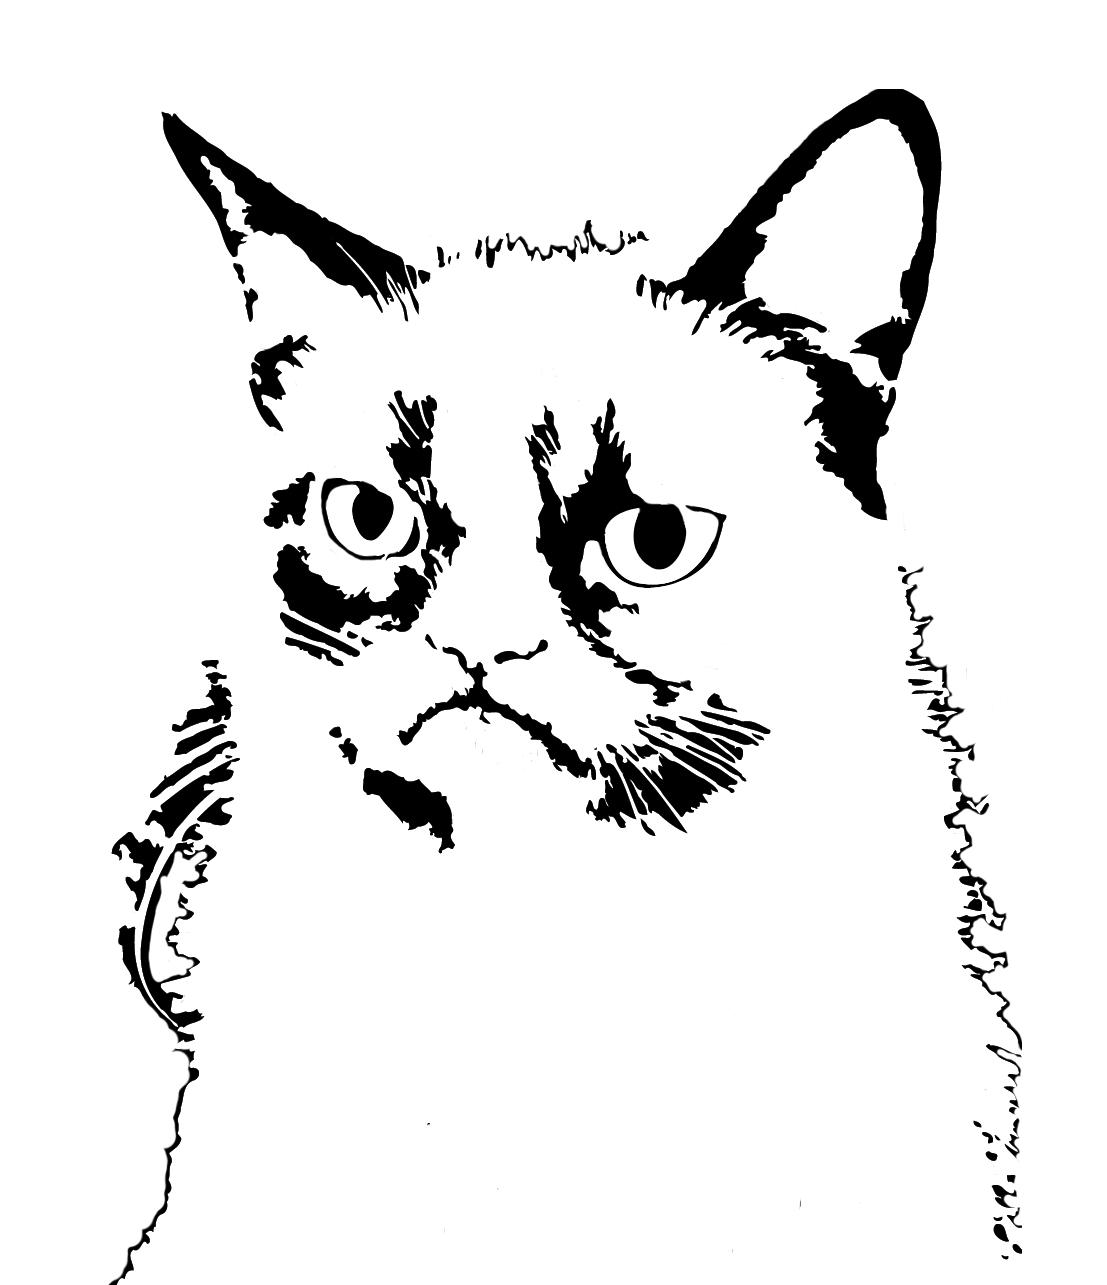 Grumpy cat stencil for graffiti art pumpkin carving for Easy whiteboard drawings